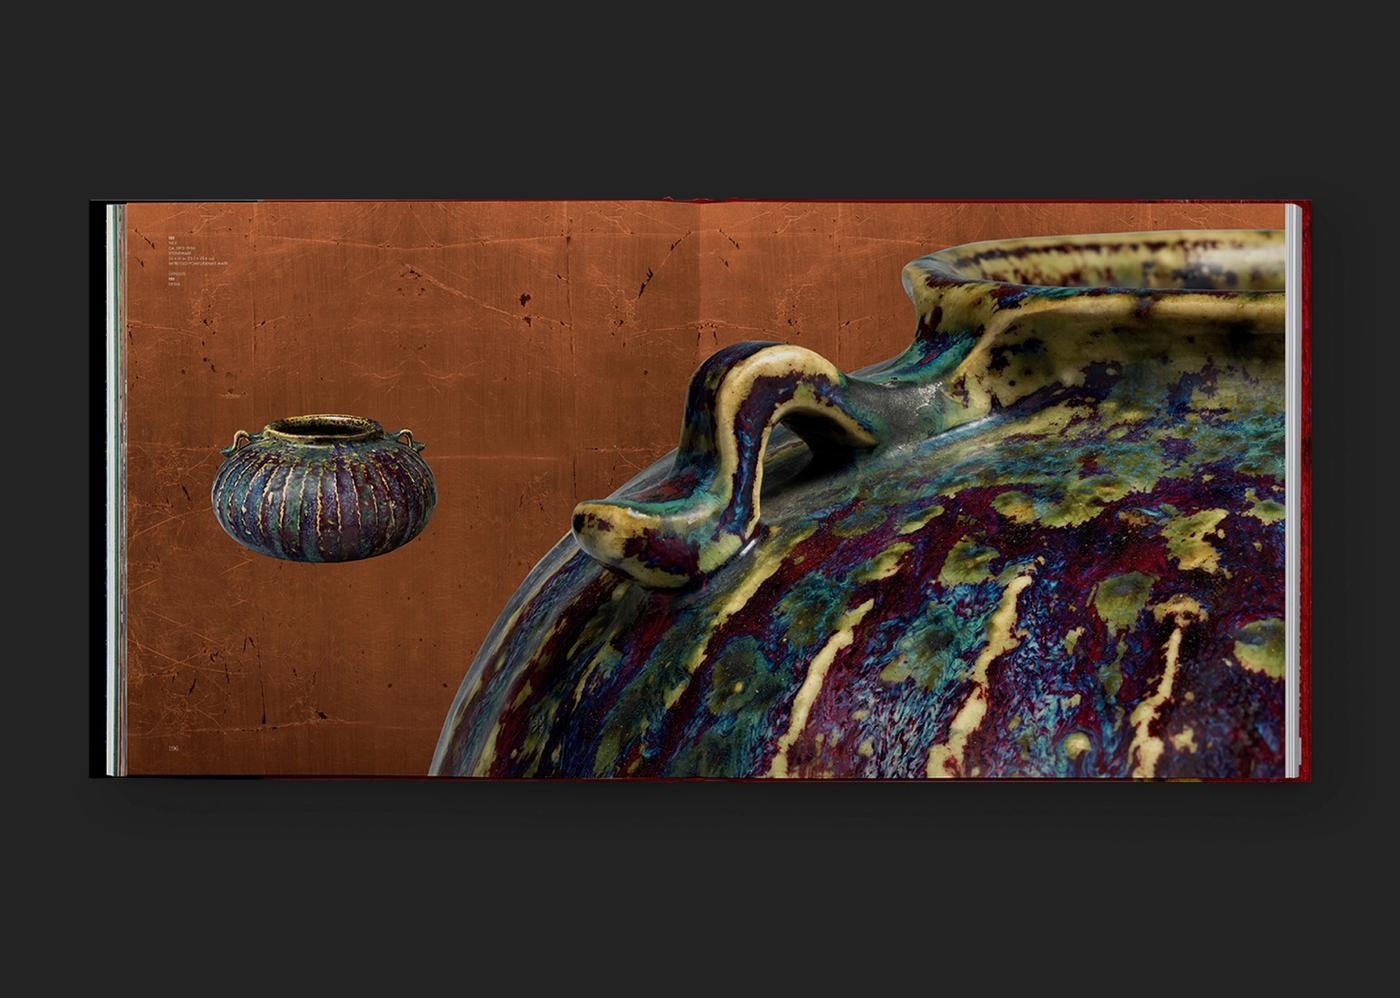 Spread of Adrien Dalpayrat: The Peter Marino Collection, Phaidon (2020)